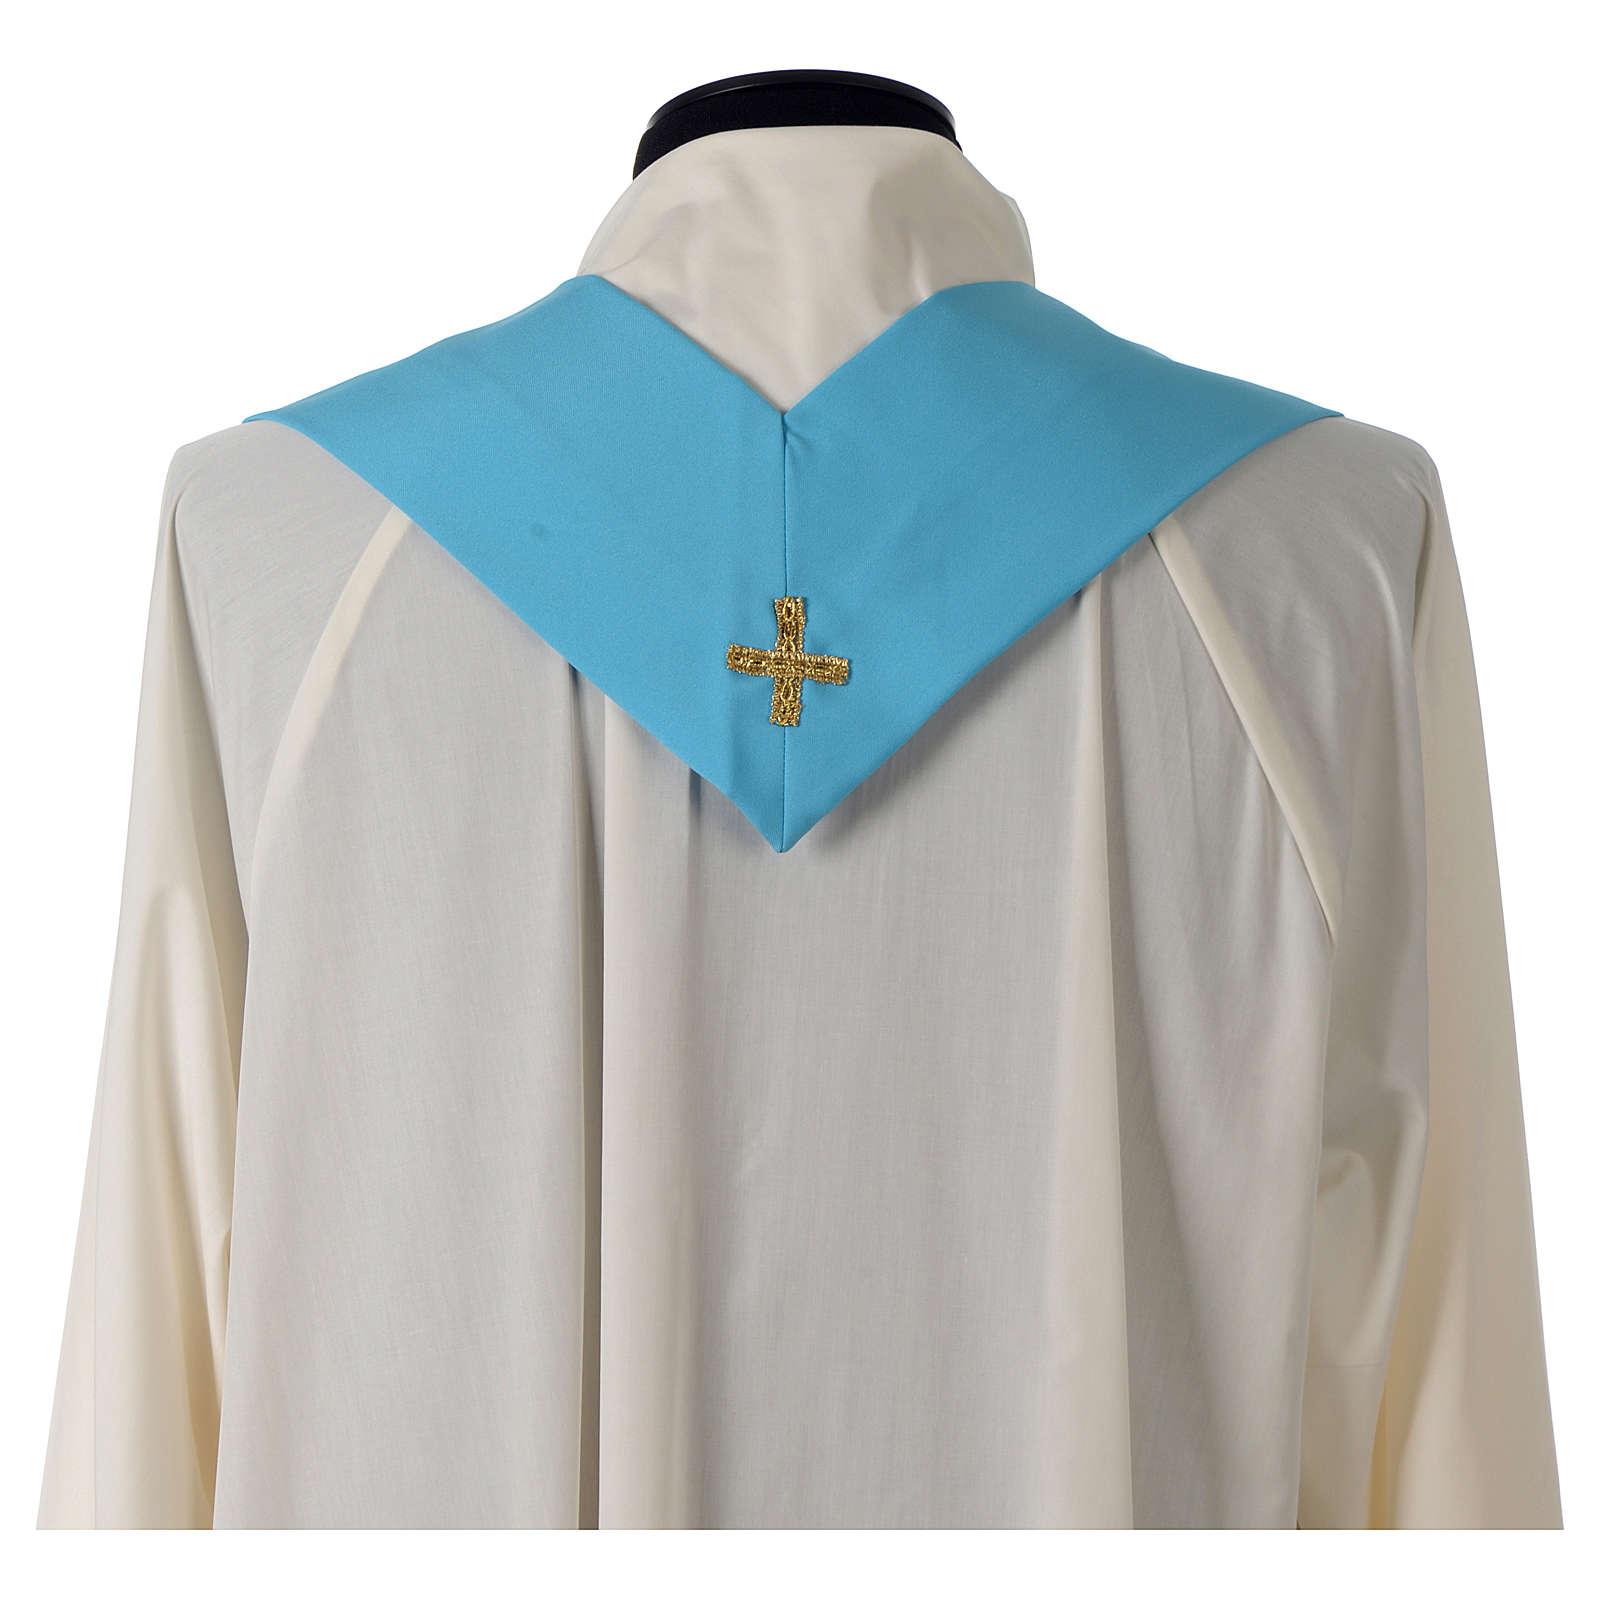 Casula simbolo mariano 4